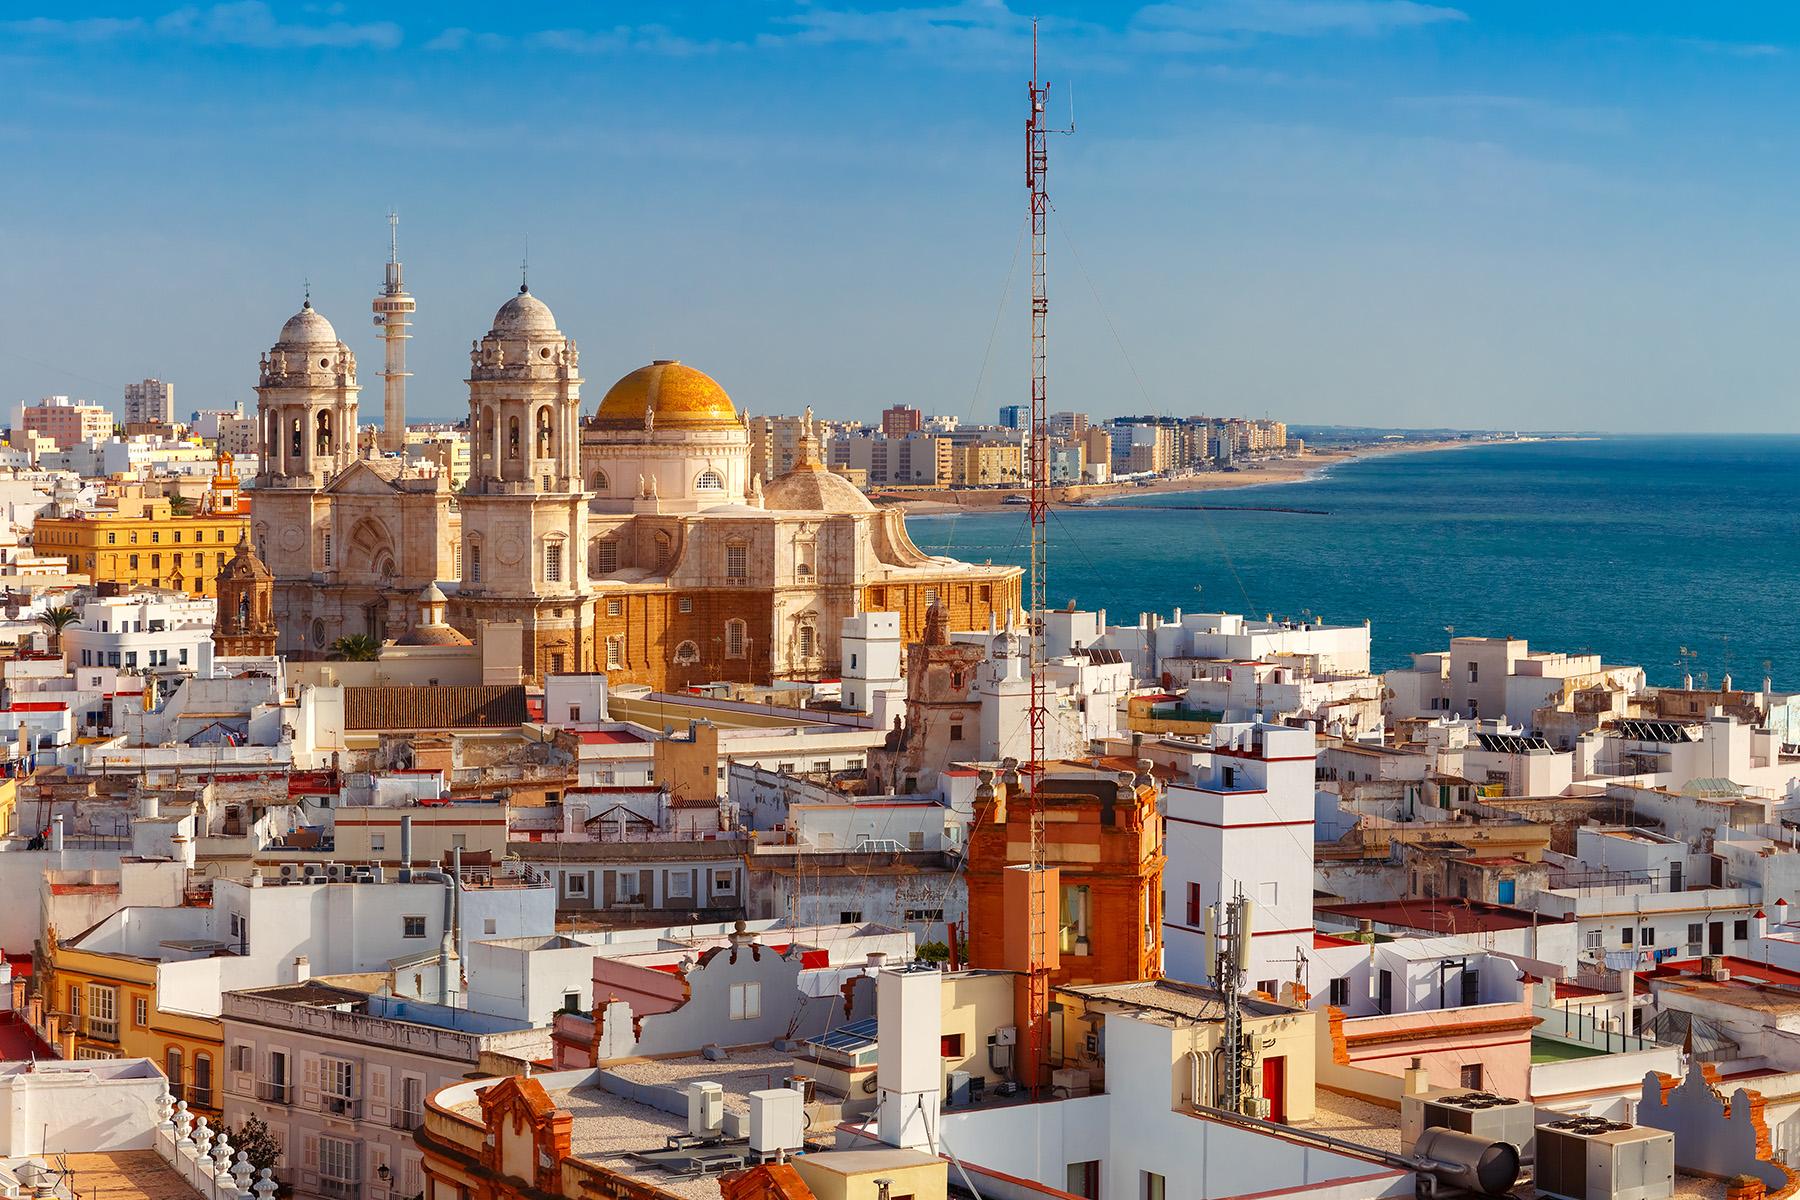 Skyline of Cádiz